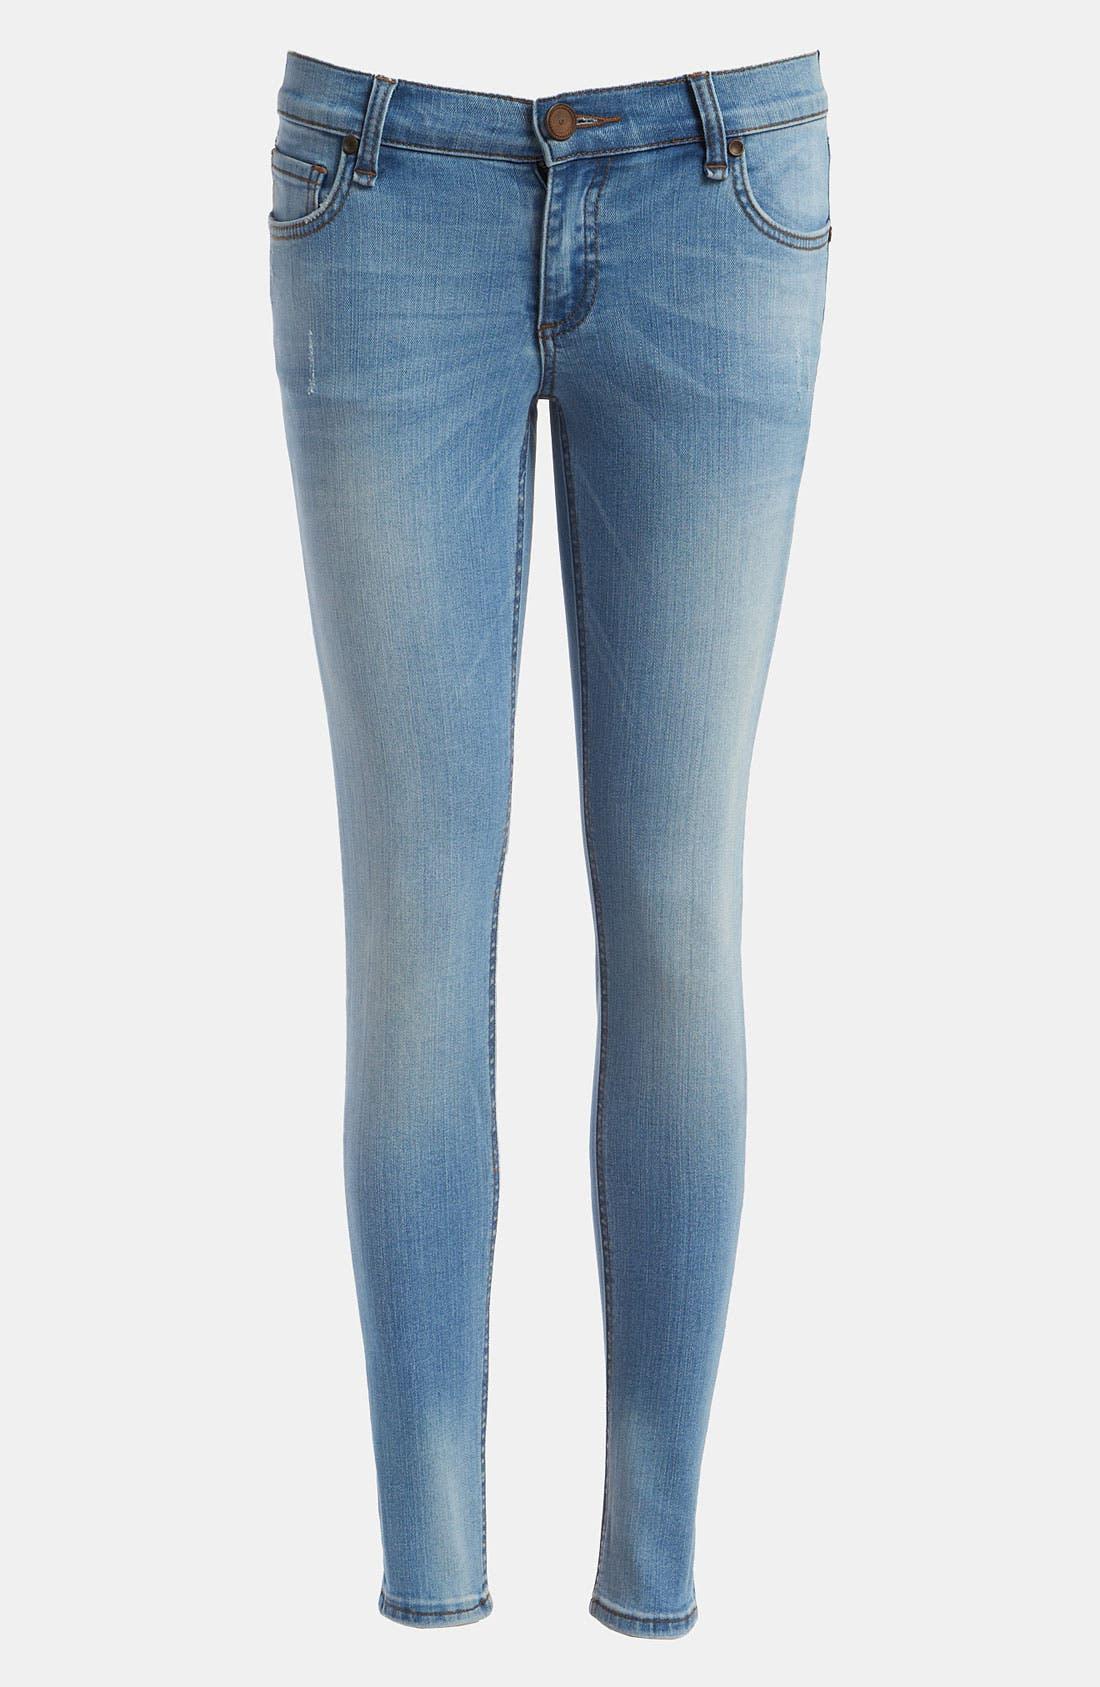 Main Image - edyson 'Sloan' Skinny Jeans (Light Pacific)